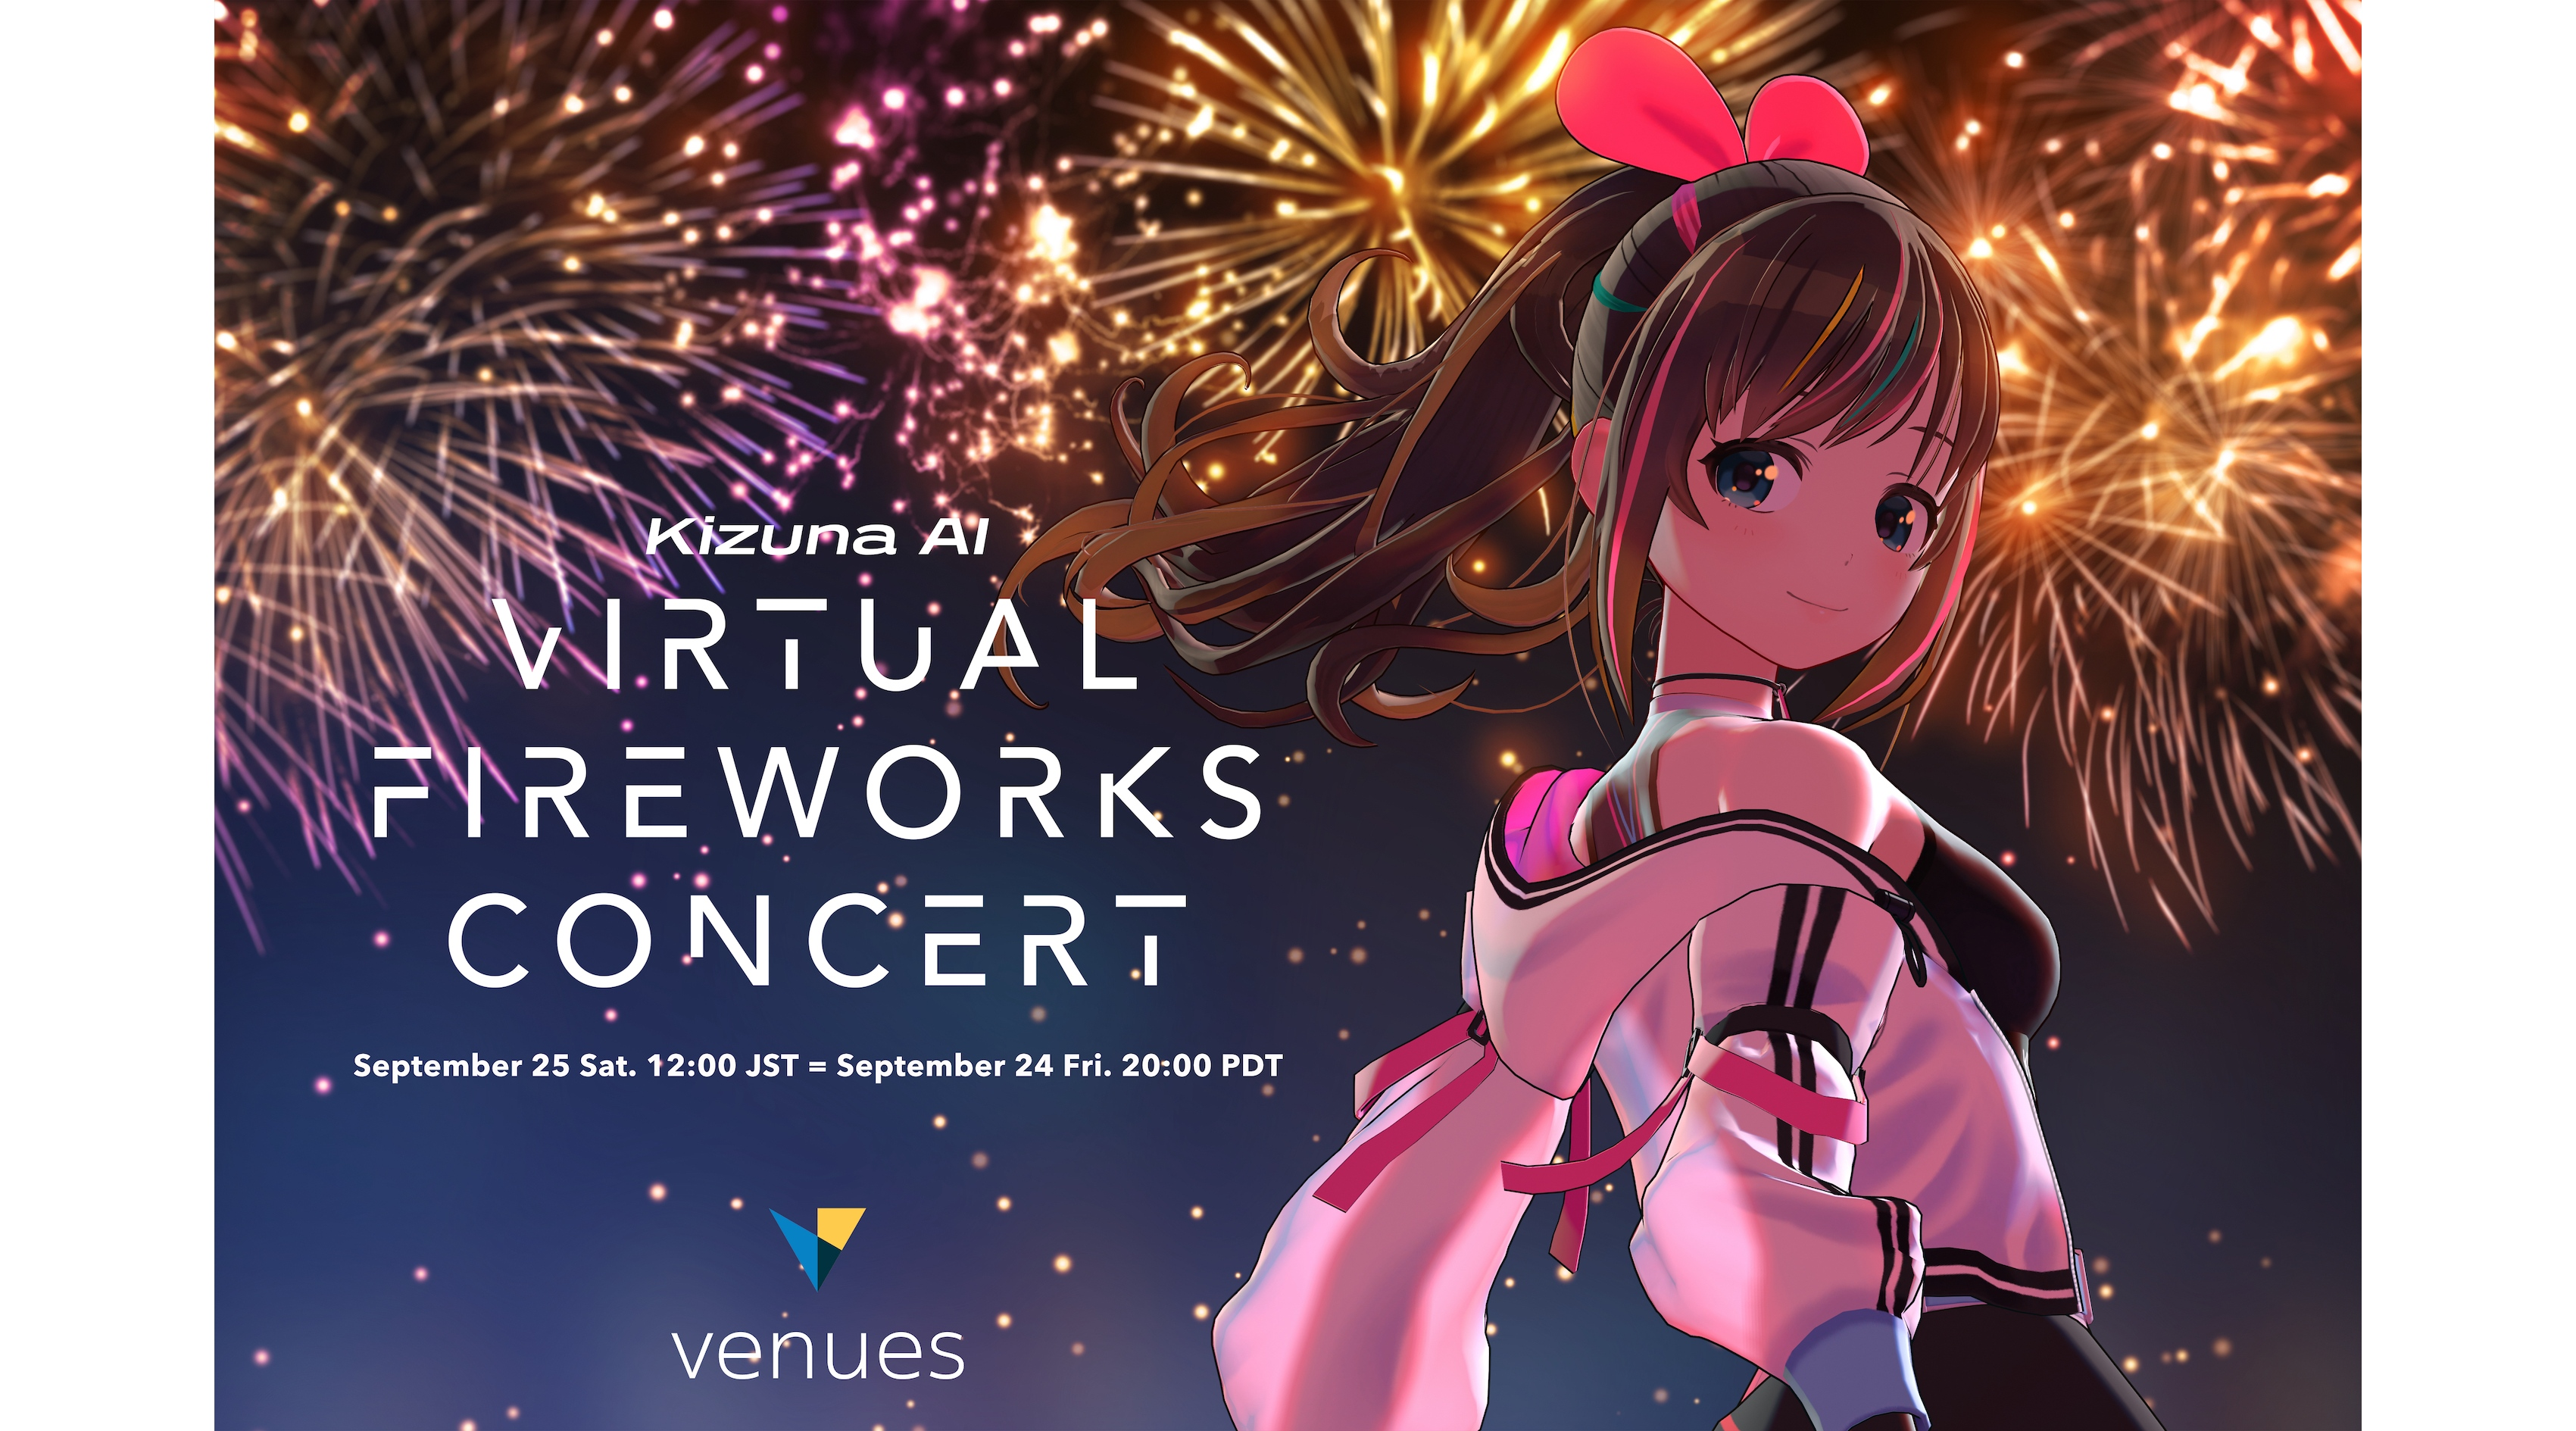 Kizuna AI Virtual Fireworks Concert1